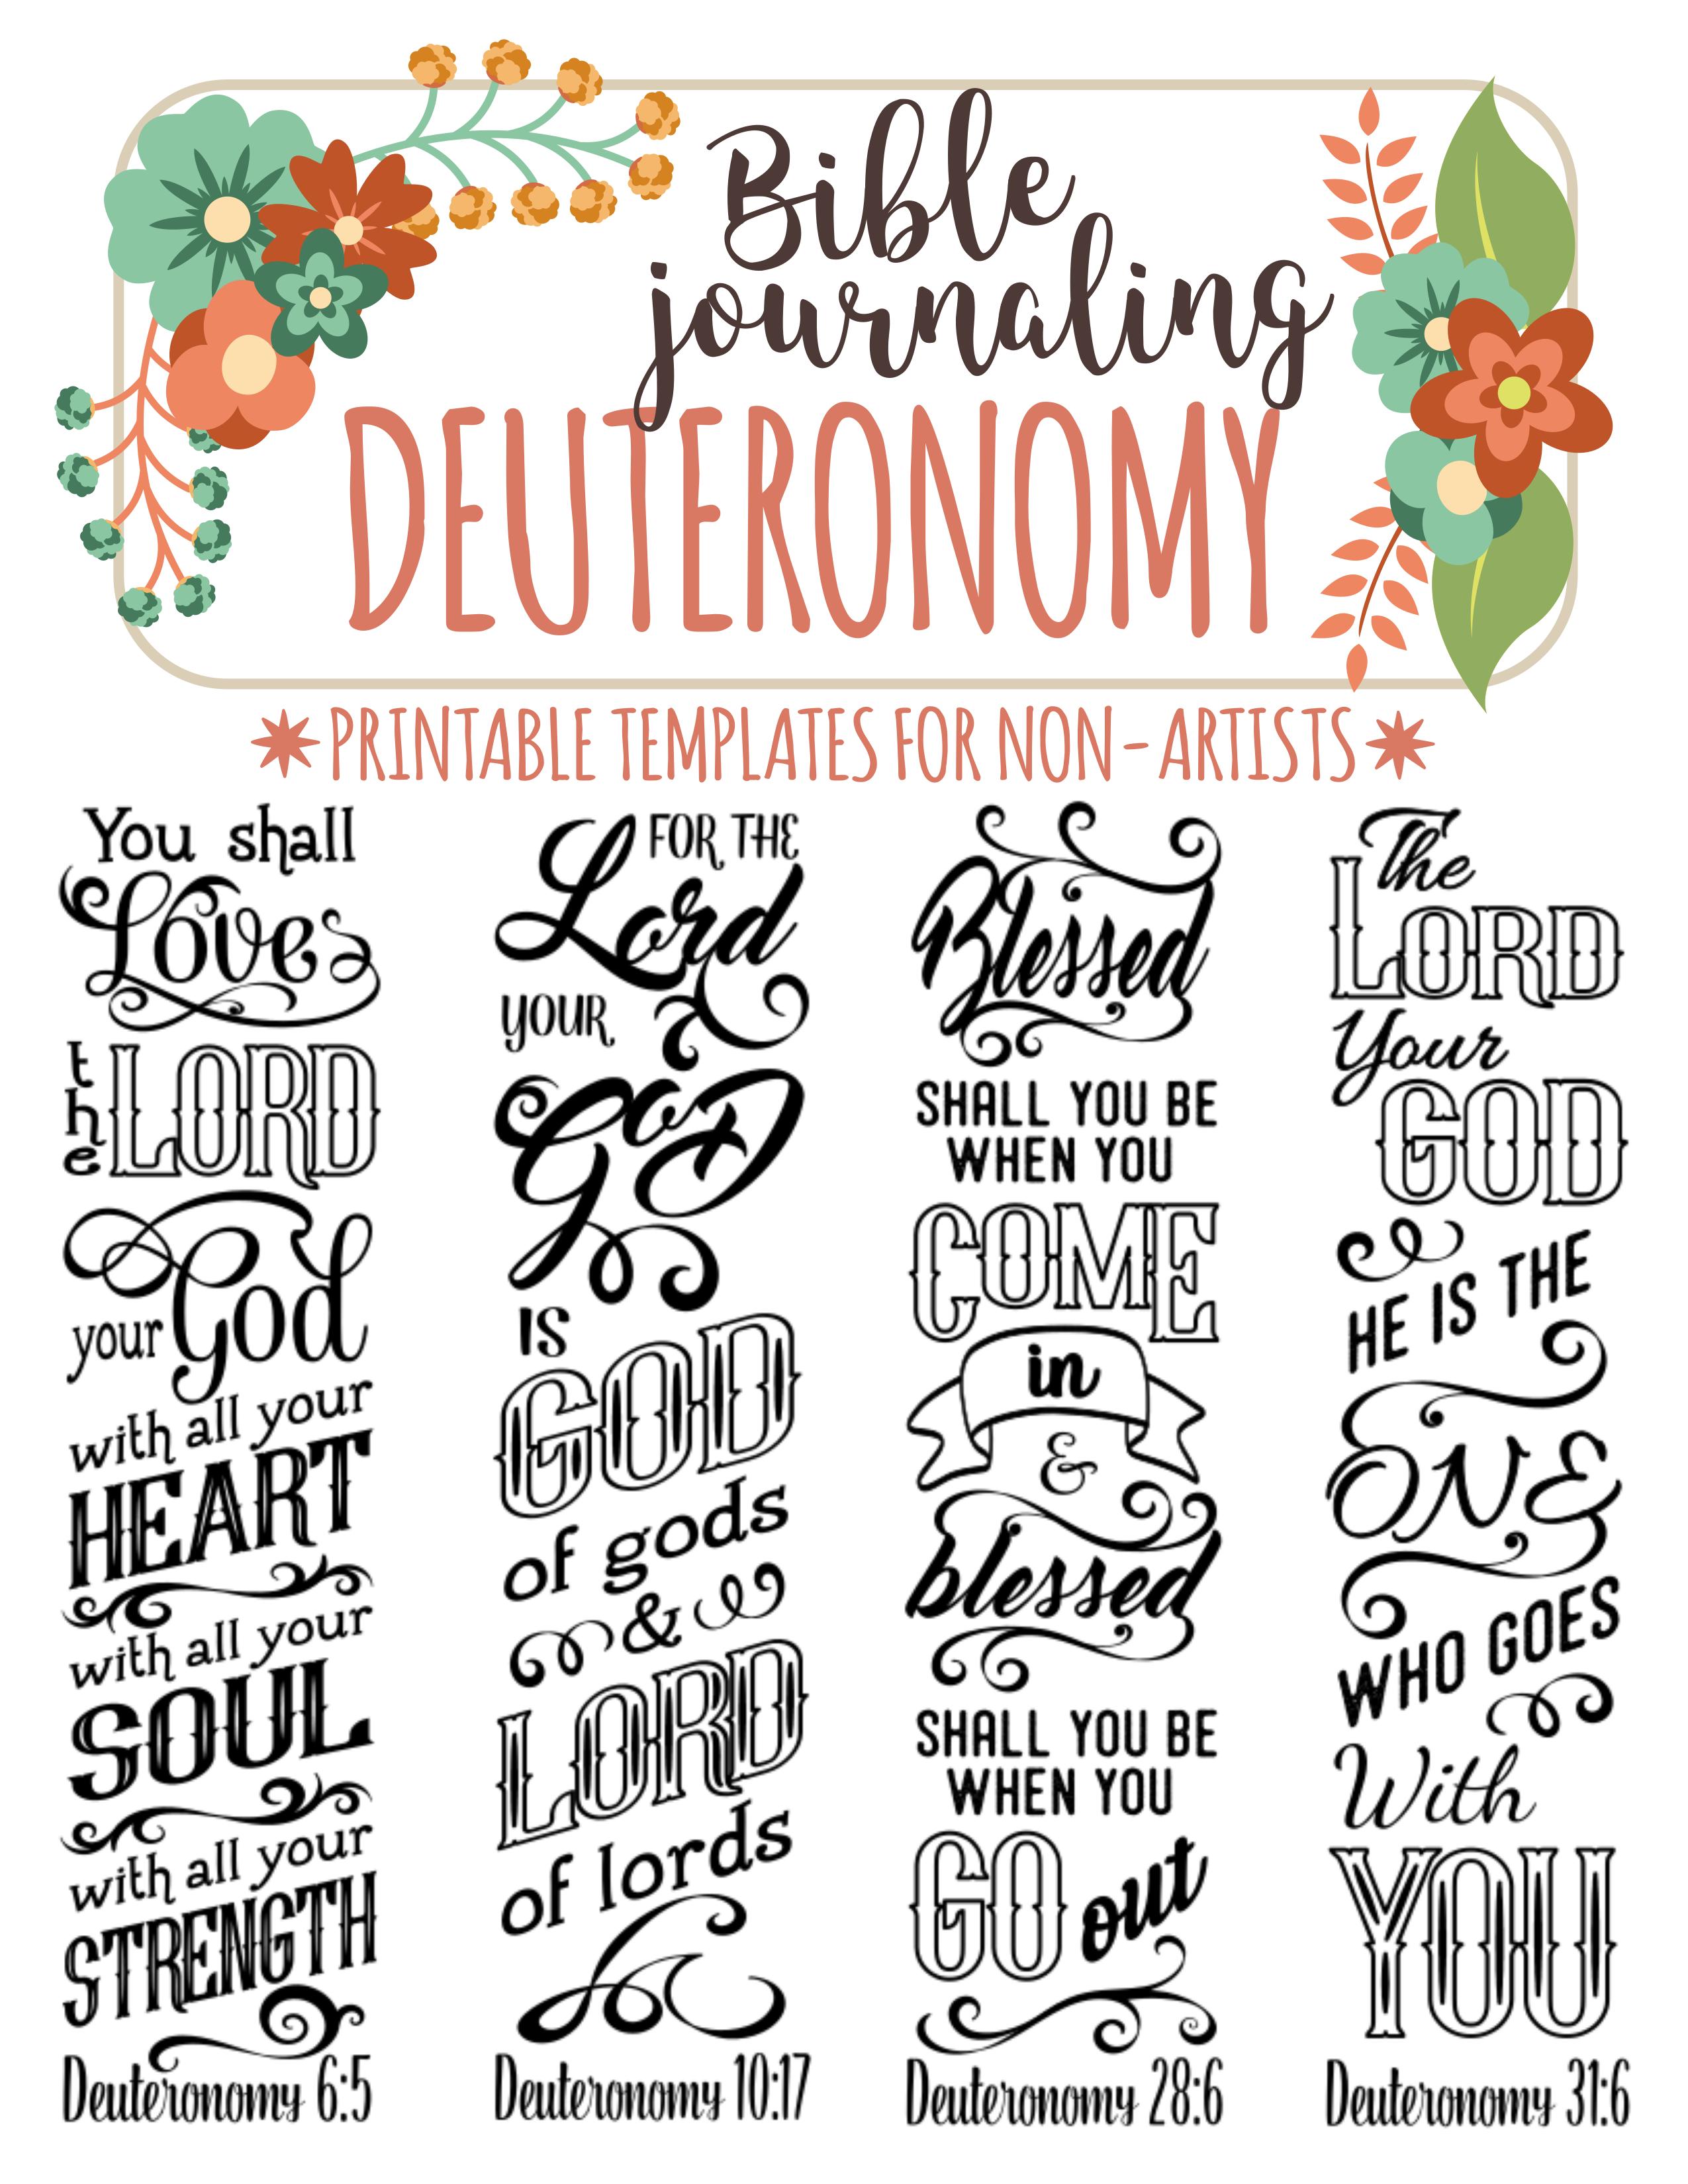 Pin On Deuteronomy